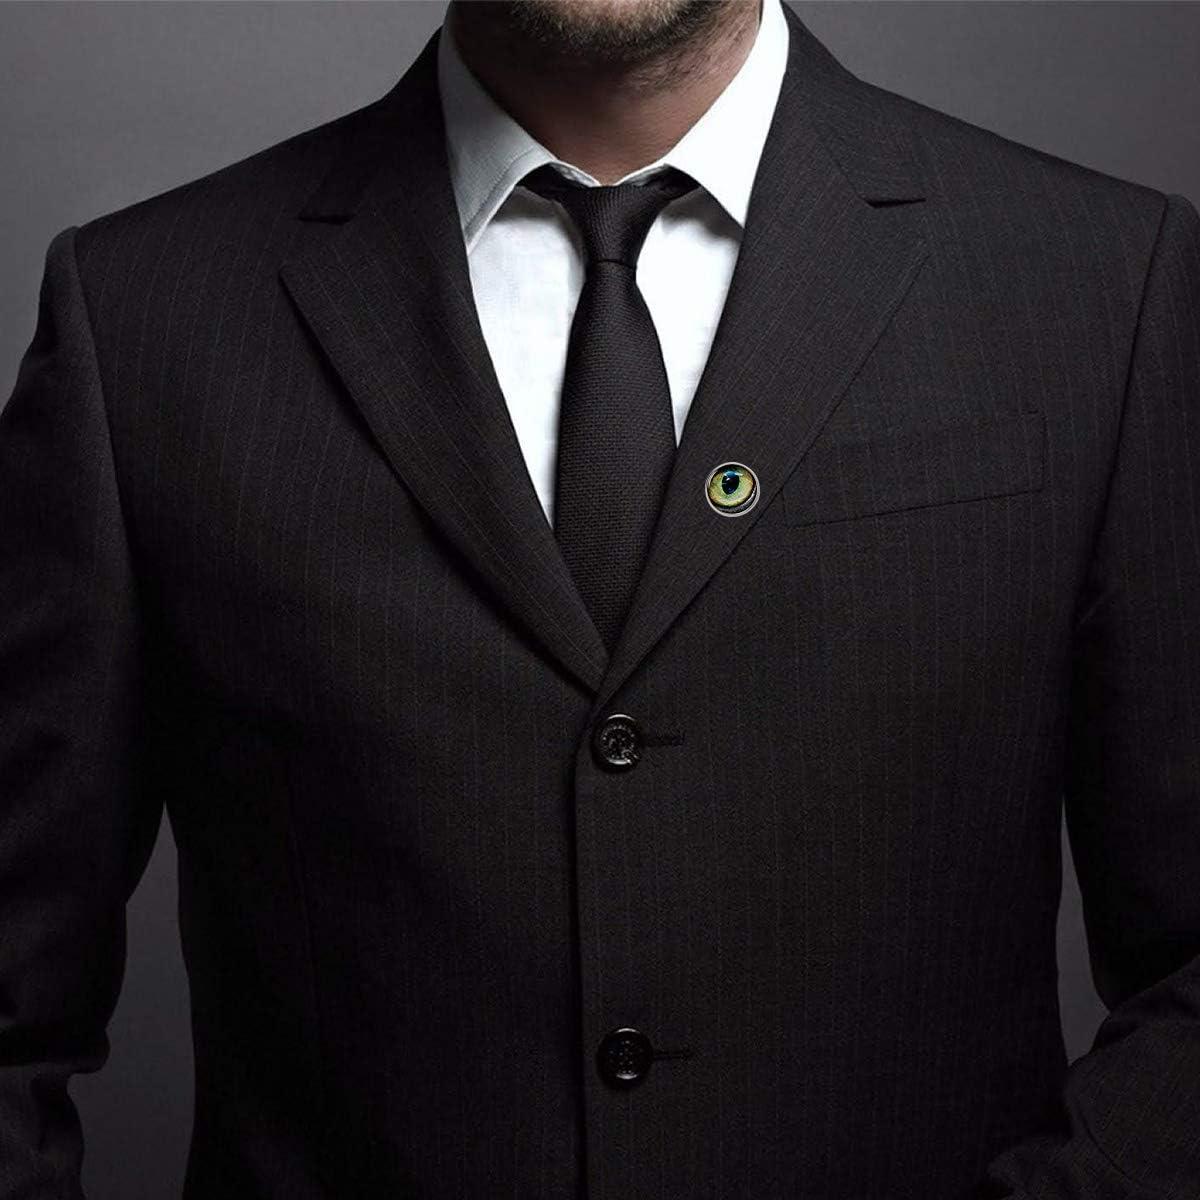 Custom Lapel Pin Brooches Print Paint Animal Eyes Banquet Badge Pins Trendy Accessory Jacket T-Shirt Bag Hat Shoe